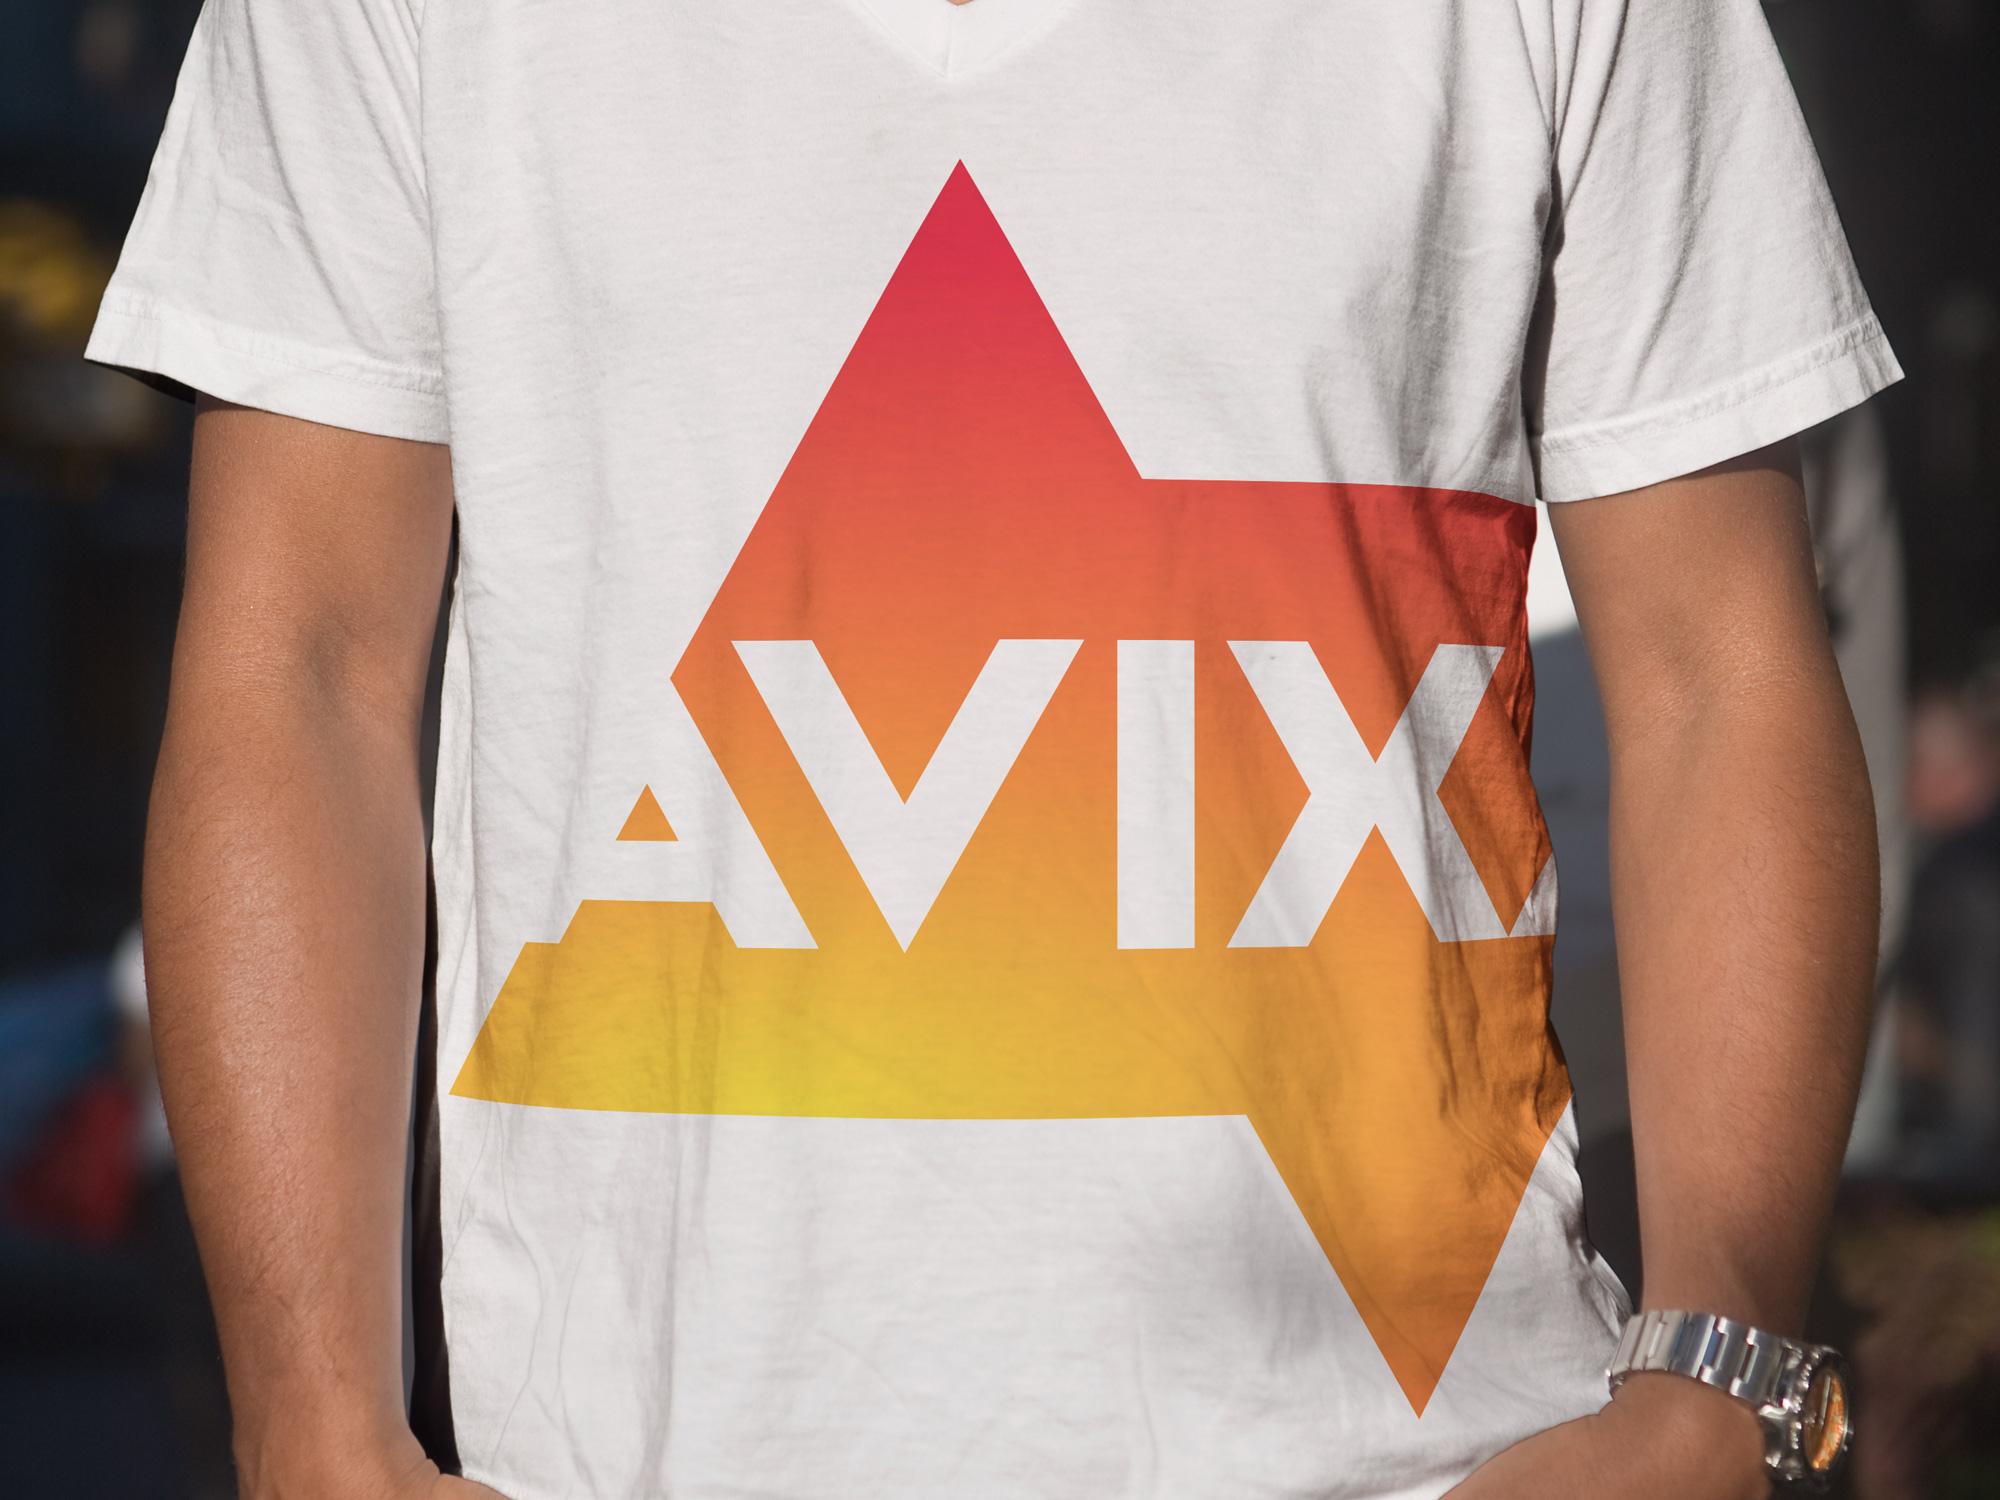 avixa-application-swag-shirt